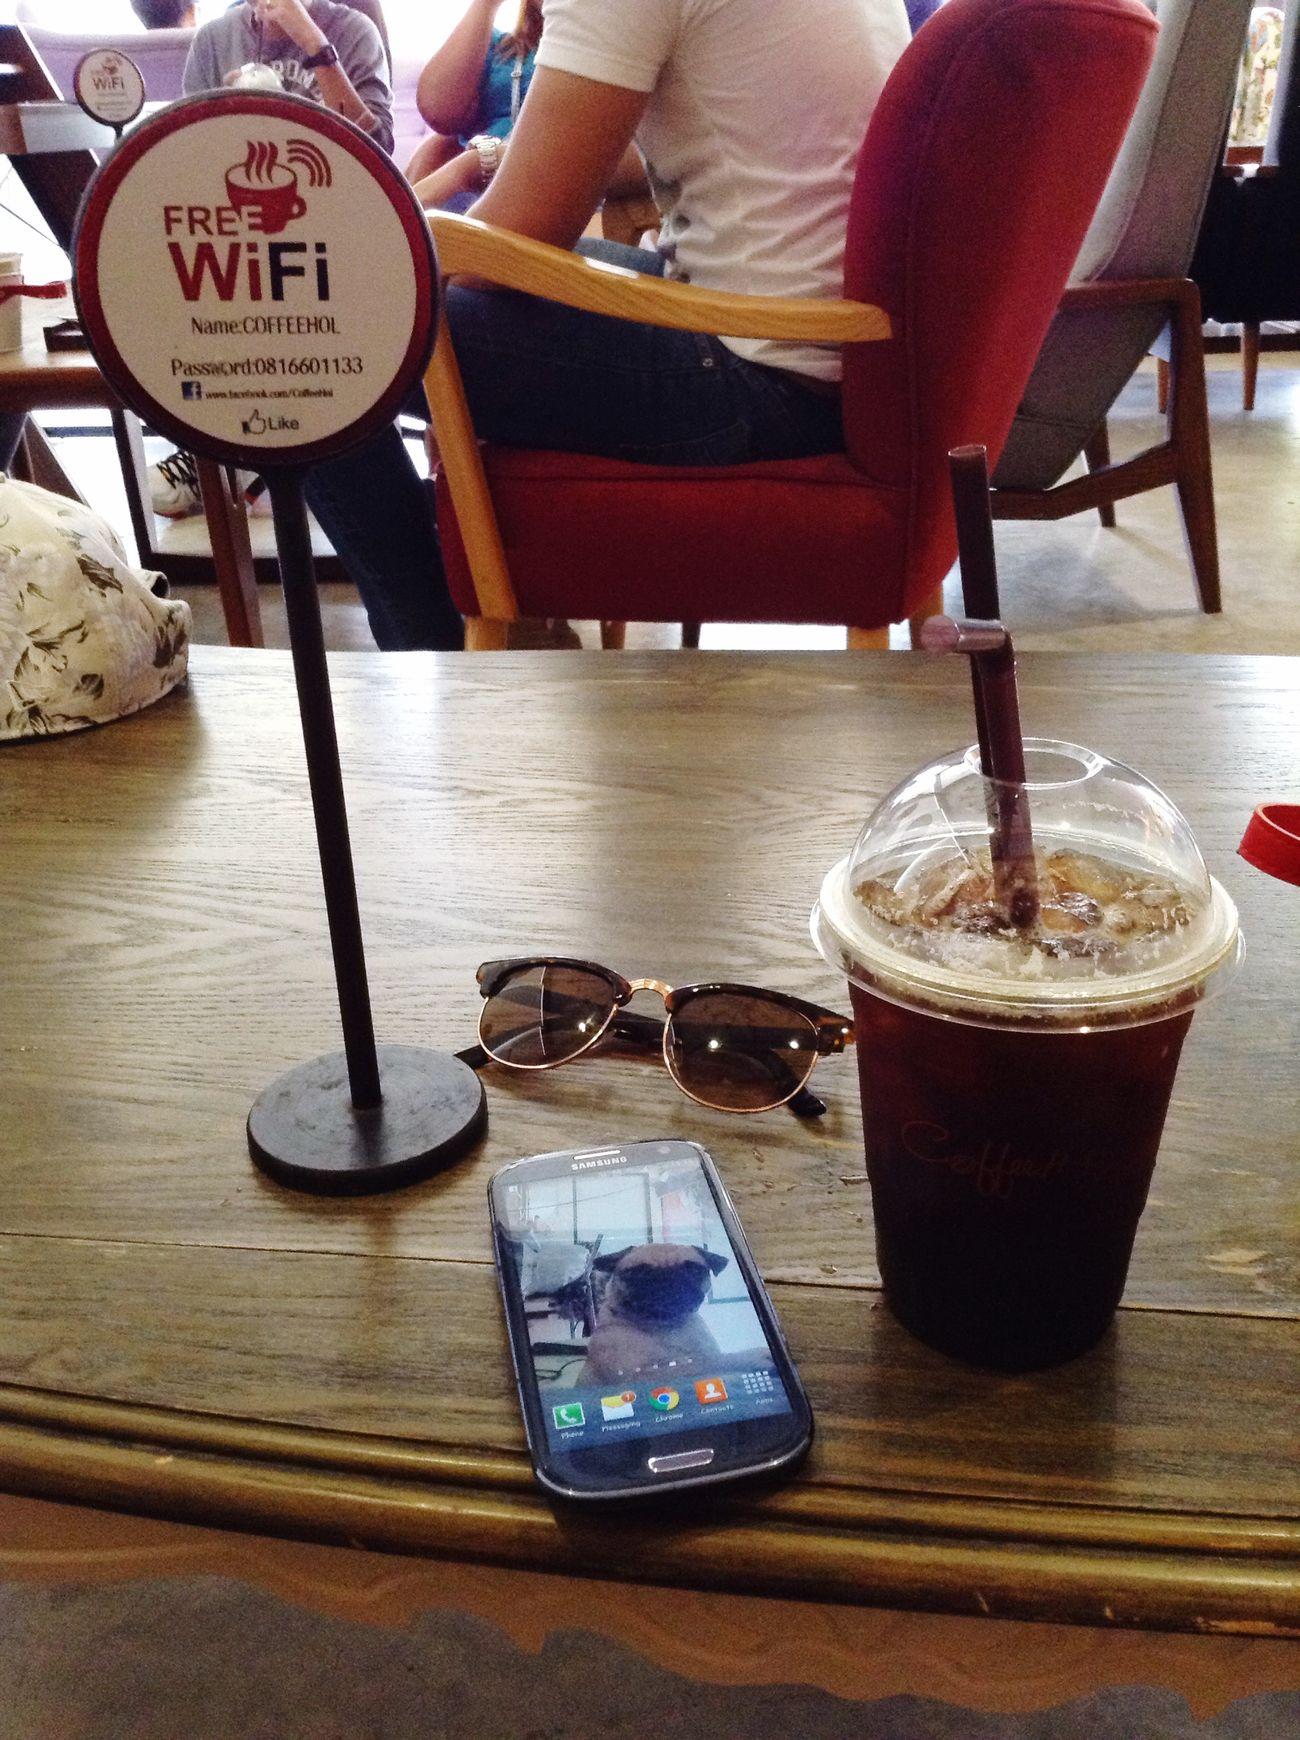 Coffee Break .... Cafe Americano Chilling Iced Coffee